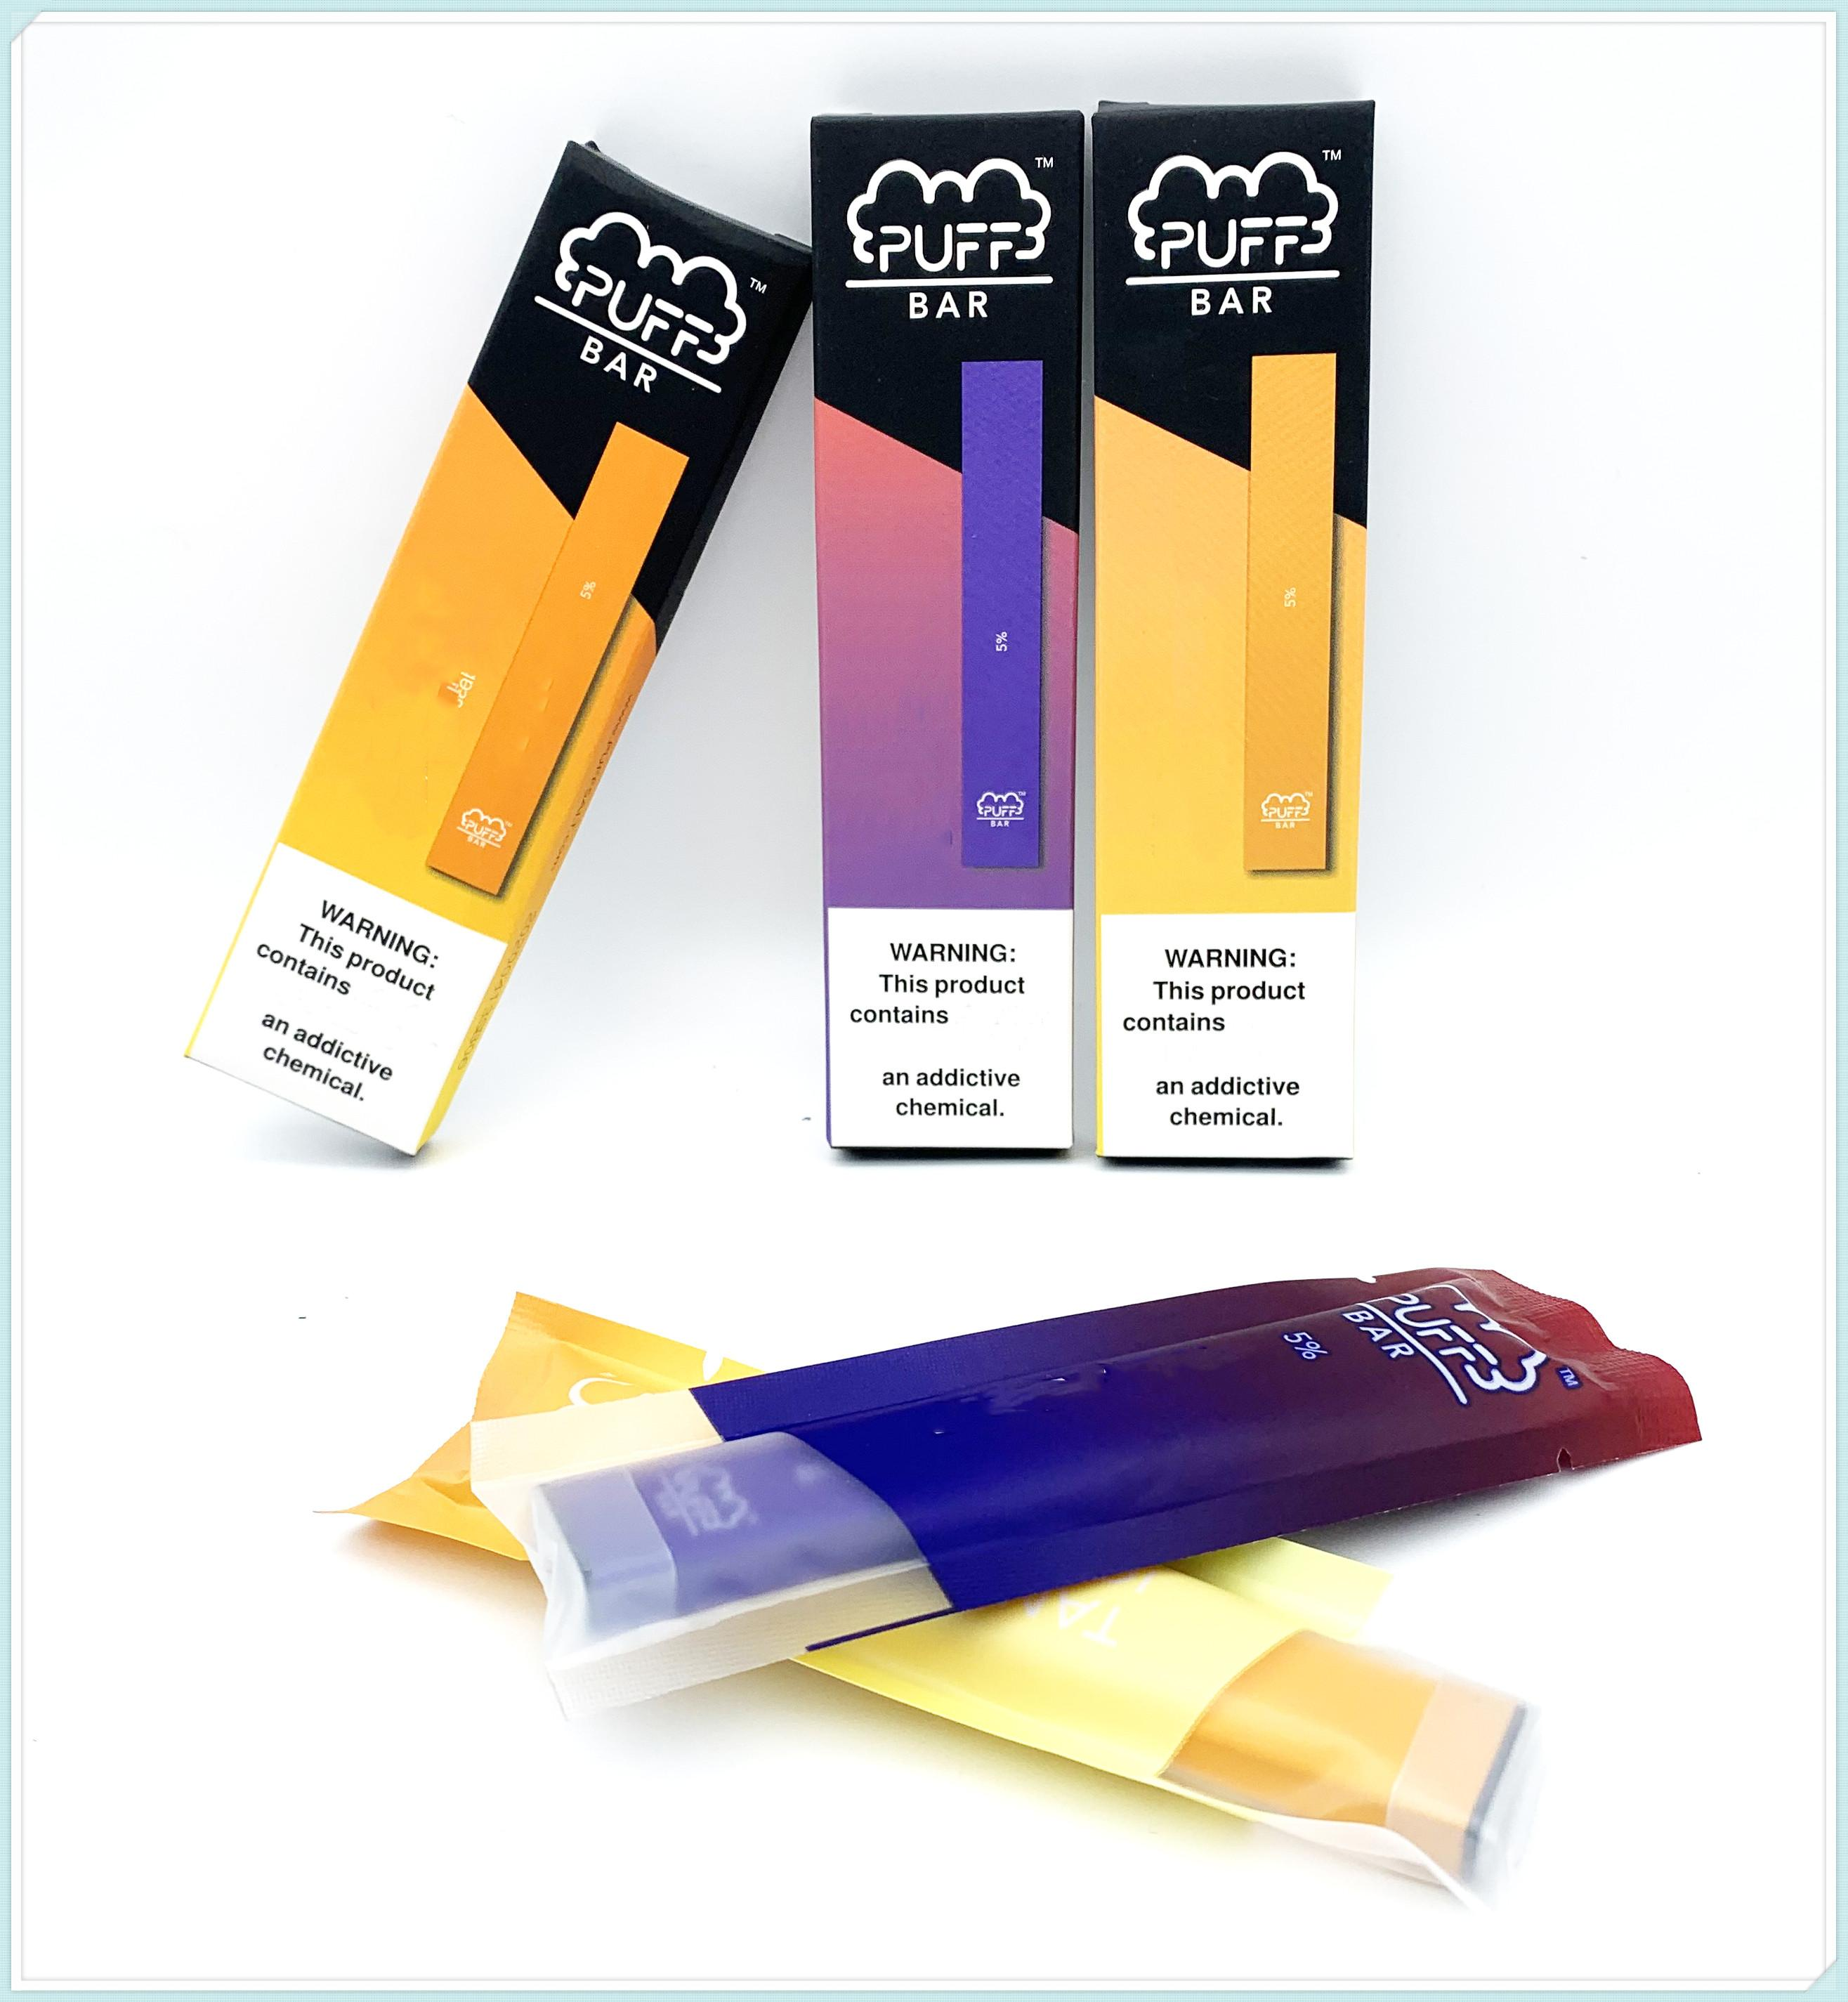 Puff Puff Bar bar dispositivo monouso Pod Vape Pen starter kit con Codice di Sicurezza 1.3ml Carrelli 280mAh batteria baccelli vuoti